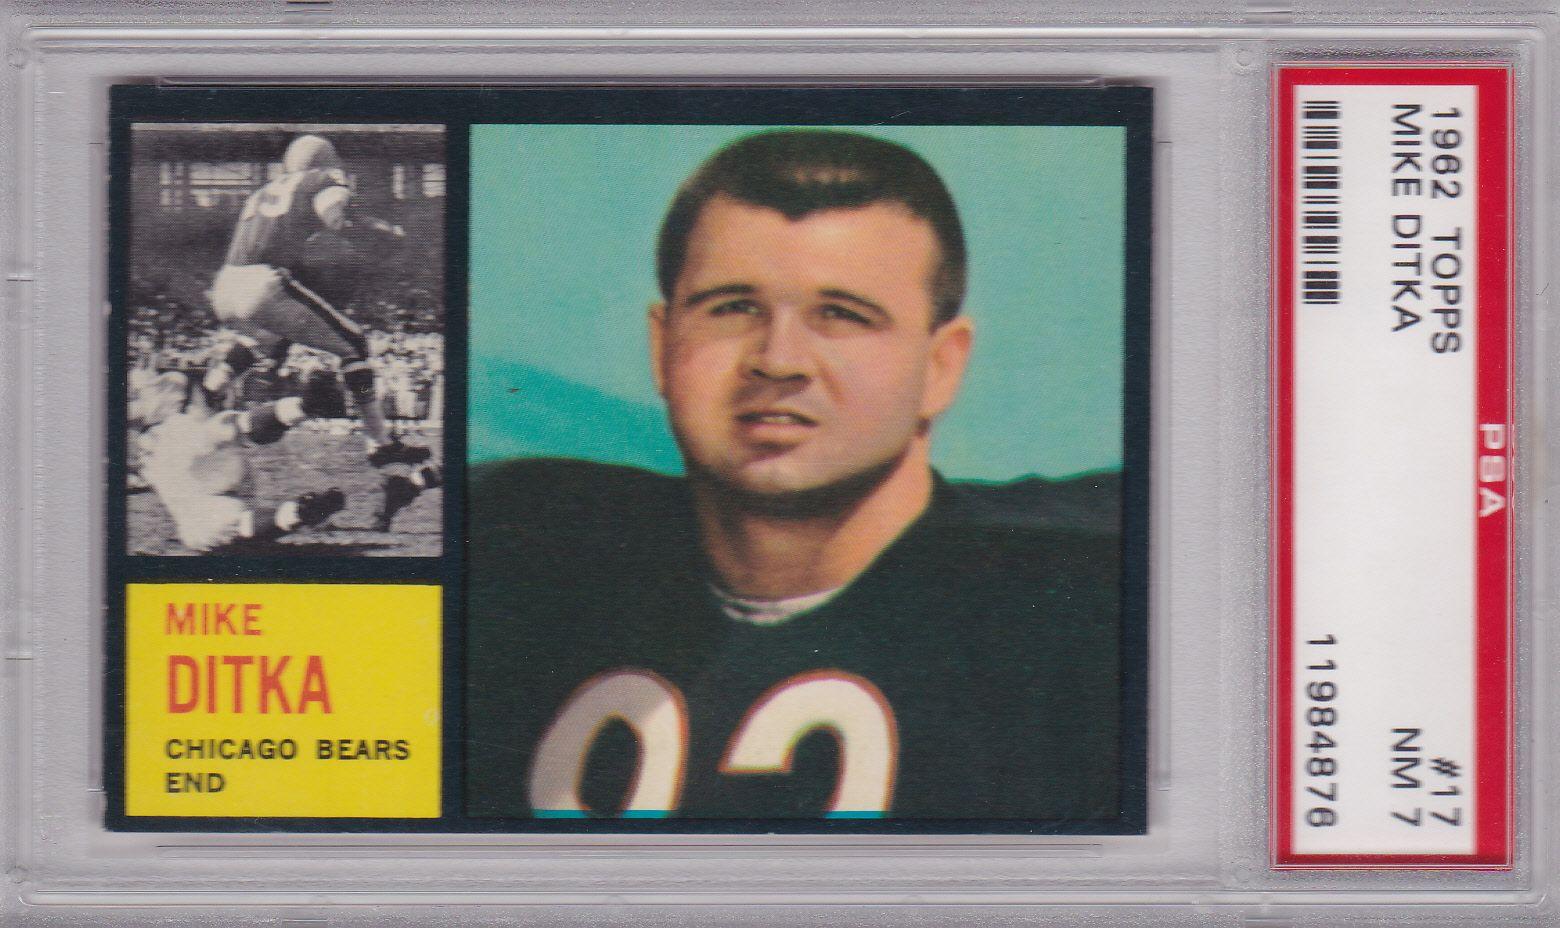 1961 Fleer Football Cards Psa | ... 90 - FranTarkenton - Vikings - PSA 6 - $225.00 - Rookie Hall of Fame